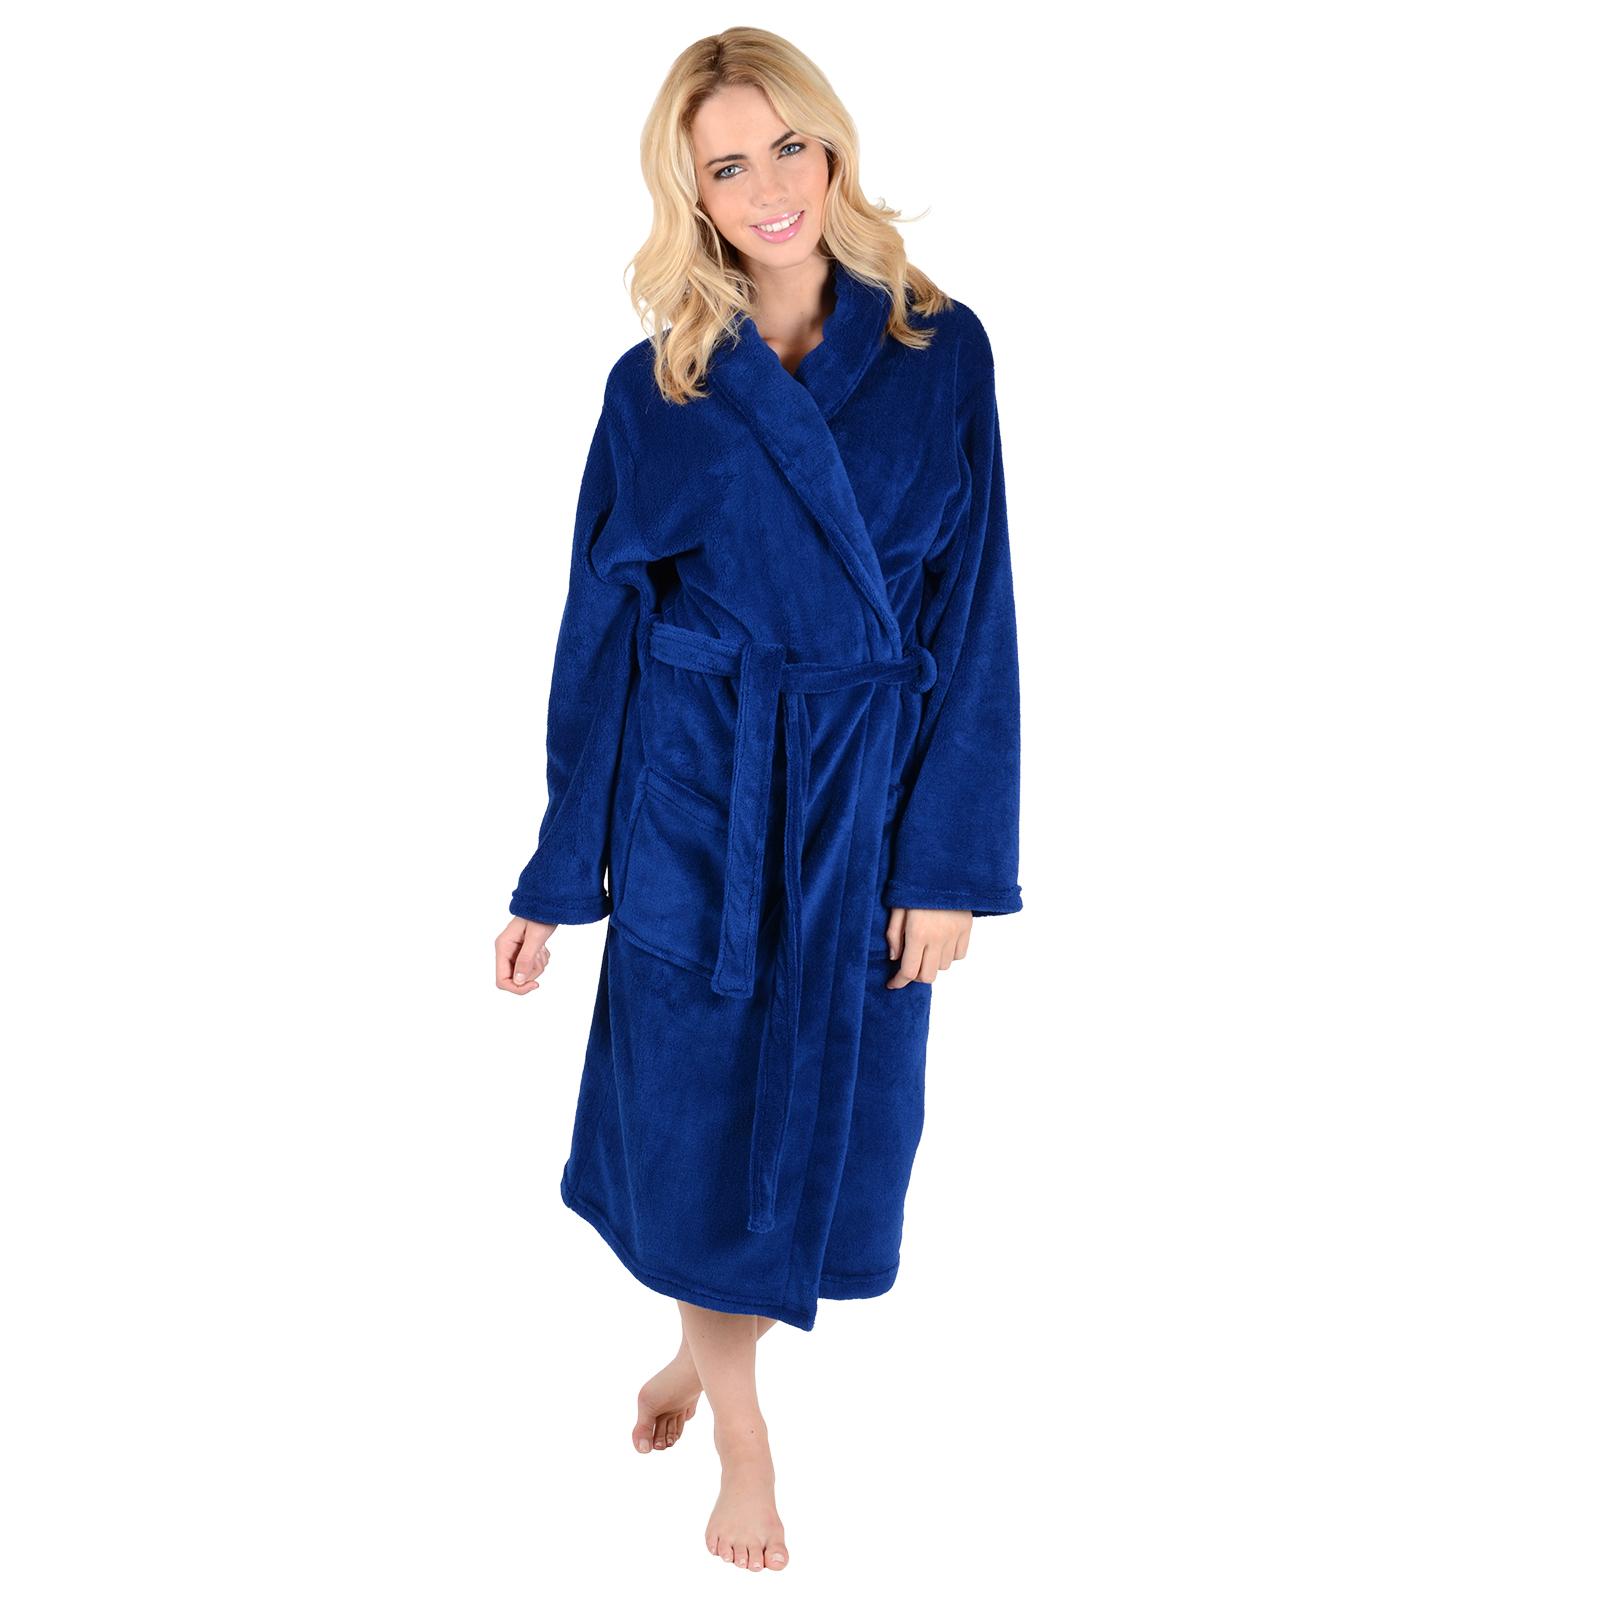 Robe: Ladies Luxury Soft Coral Fleece Bath Robe Dressing Gown